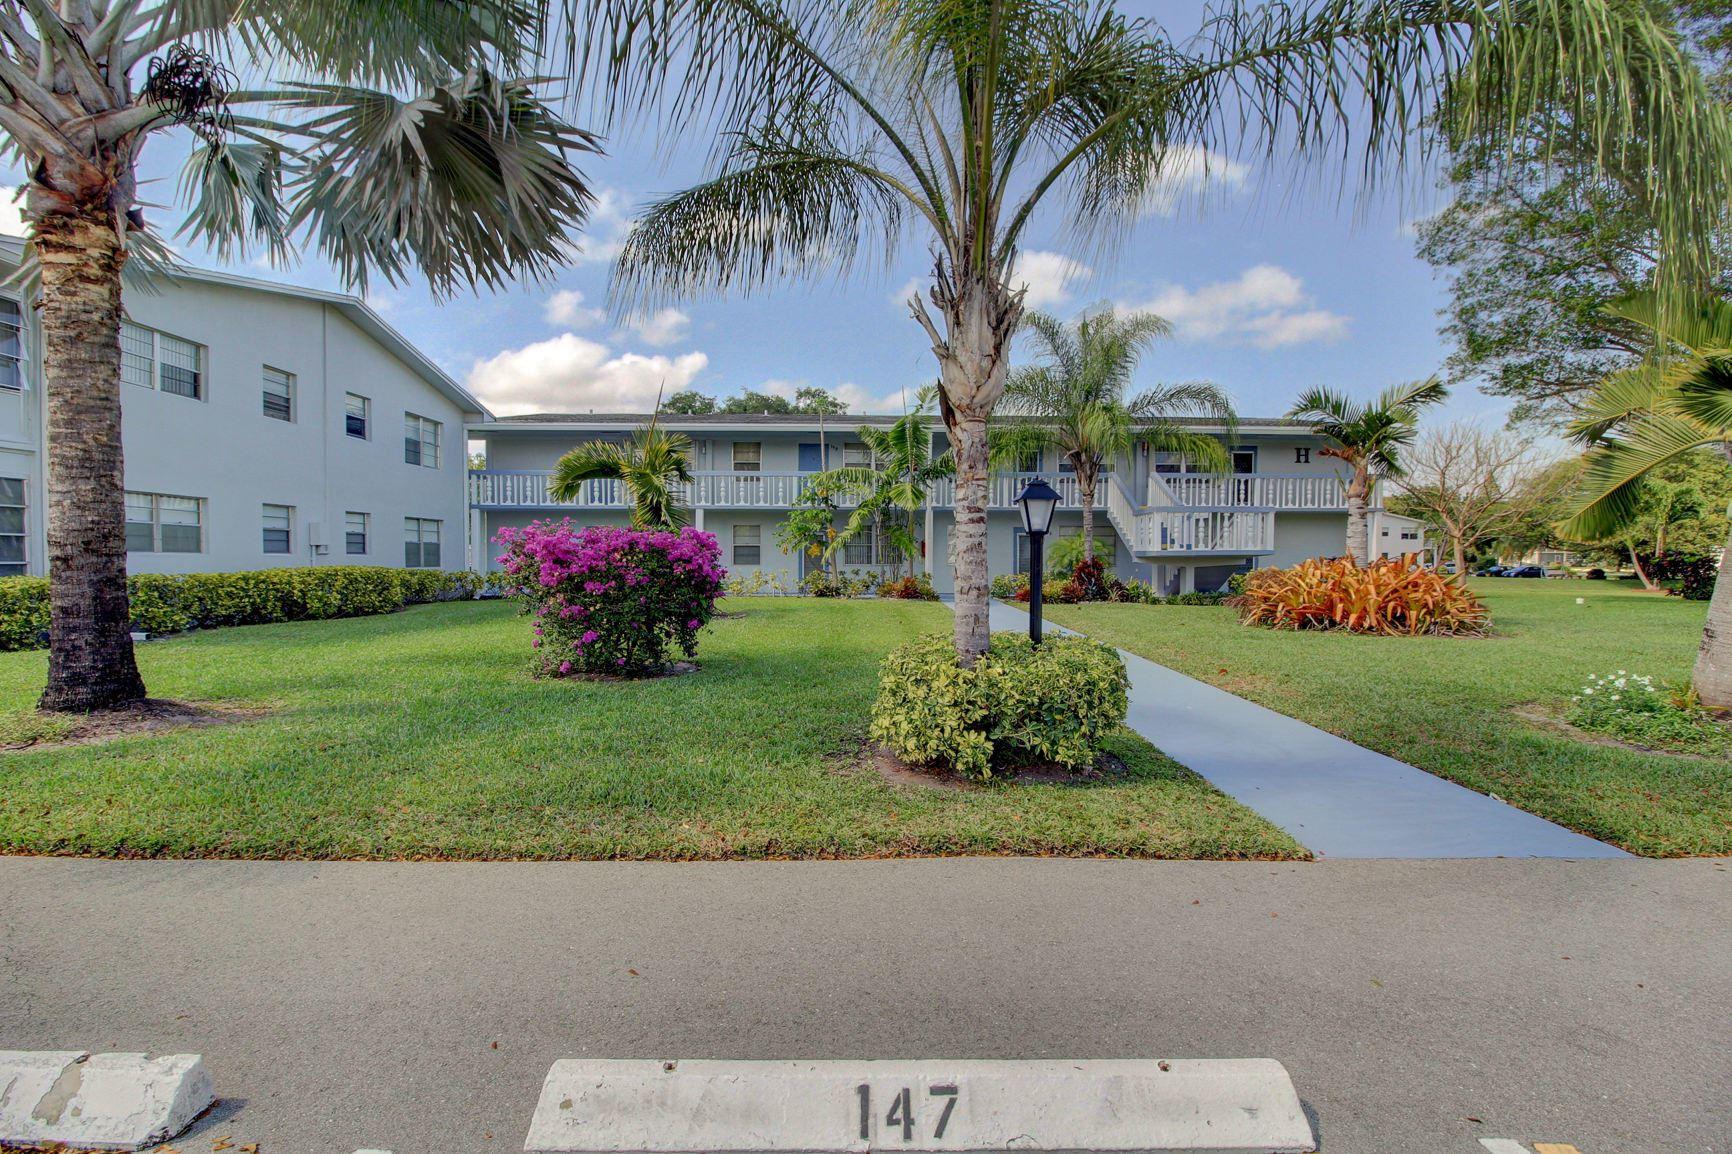 147 Prescott H #H, Deerfield Beach, FL 33442 - MLS#: RX-10711090